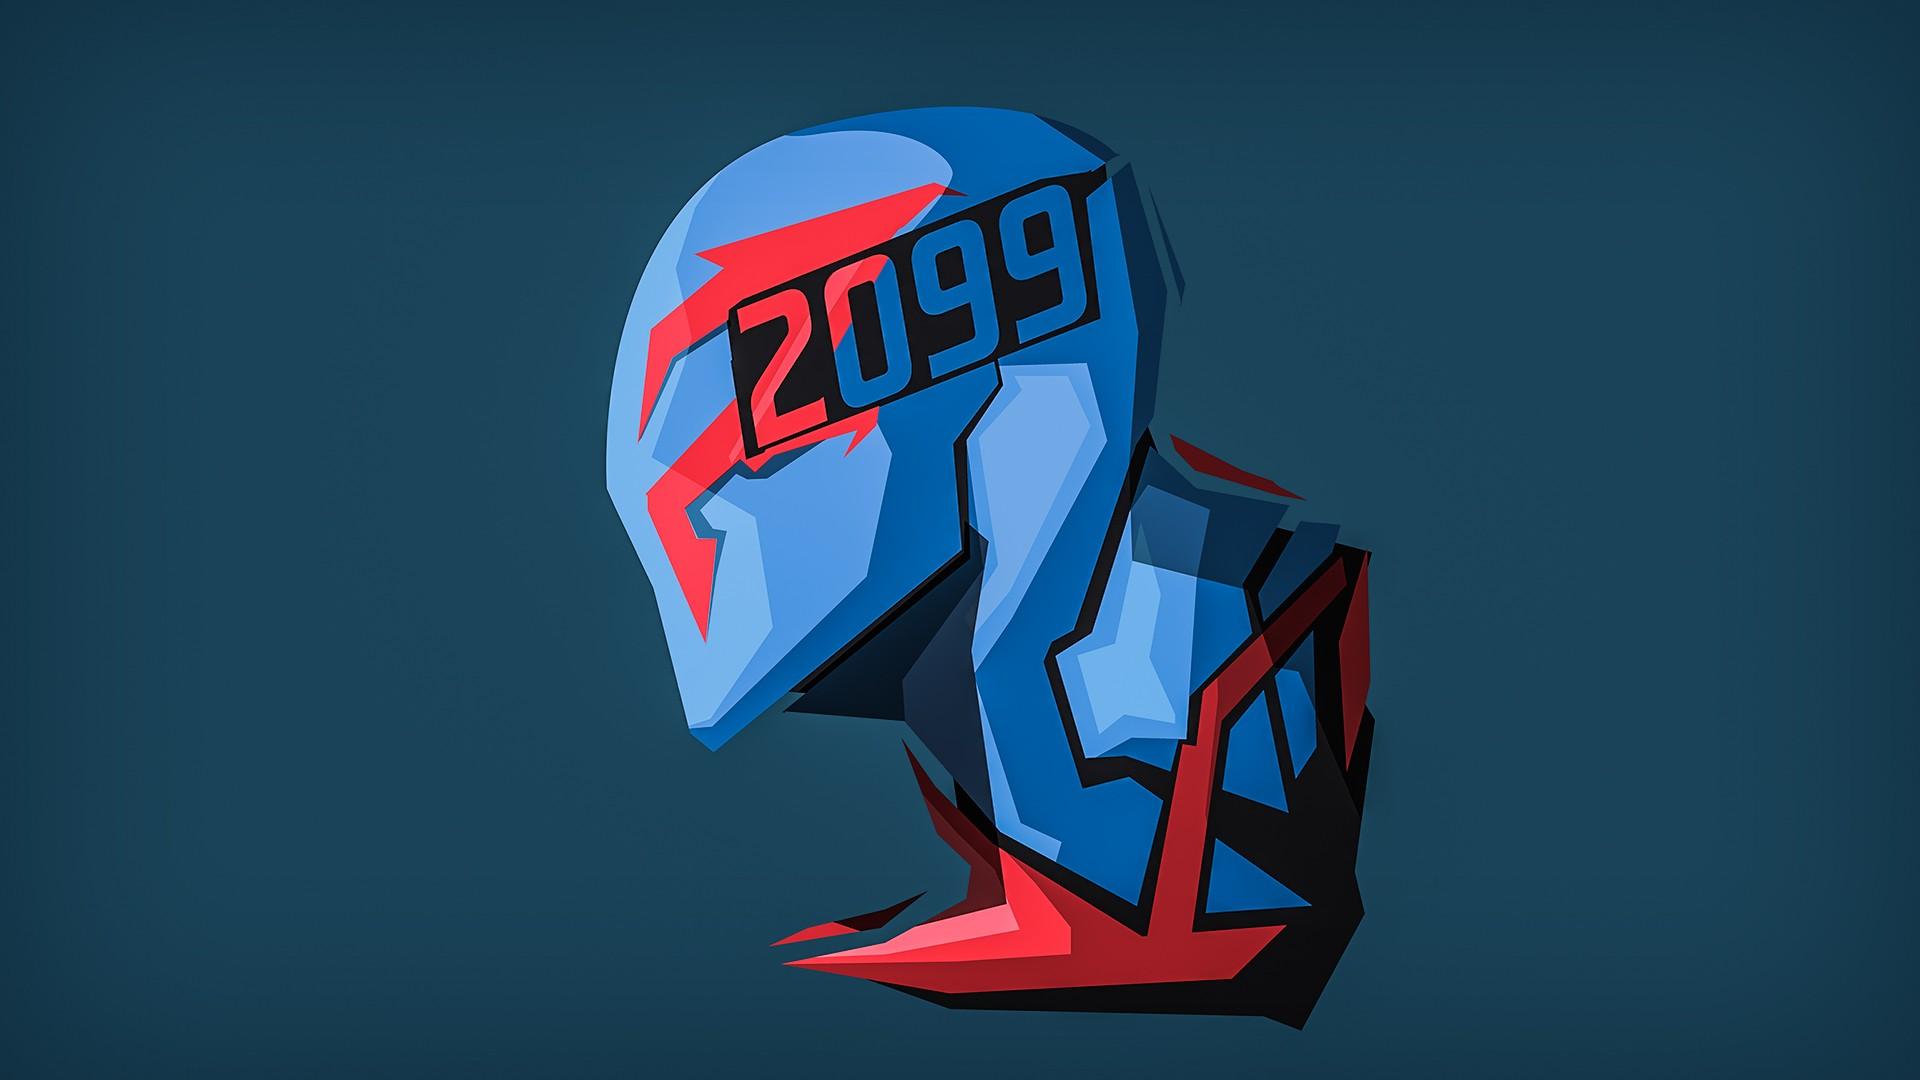 Cool Wallpaper Logo Spiderman - illustration-logo-superhero-Spider-Man-brand-Spider-Man-2099-screenshot-computer-wallpaper-fictional-character-font-577687  Picture_97214.jpg